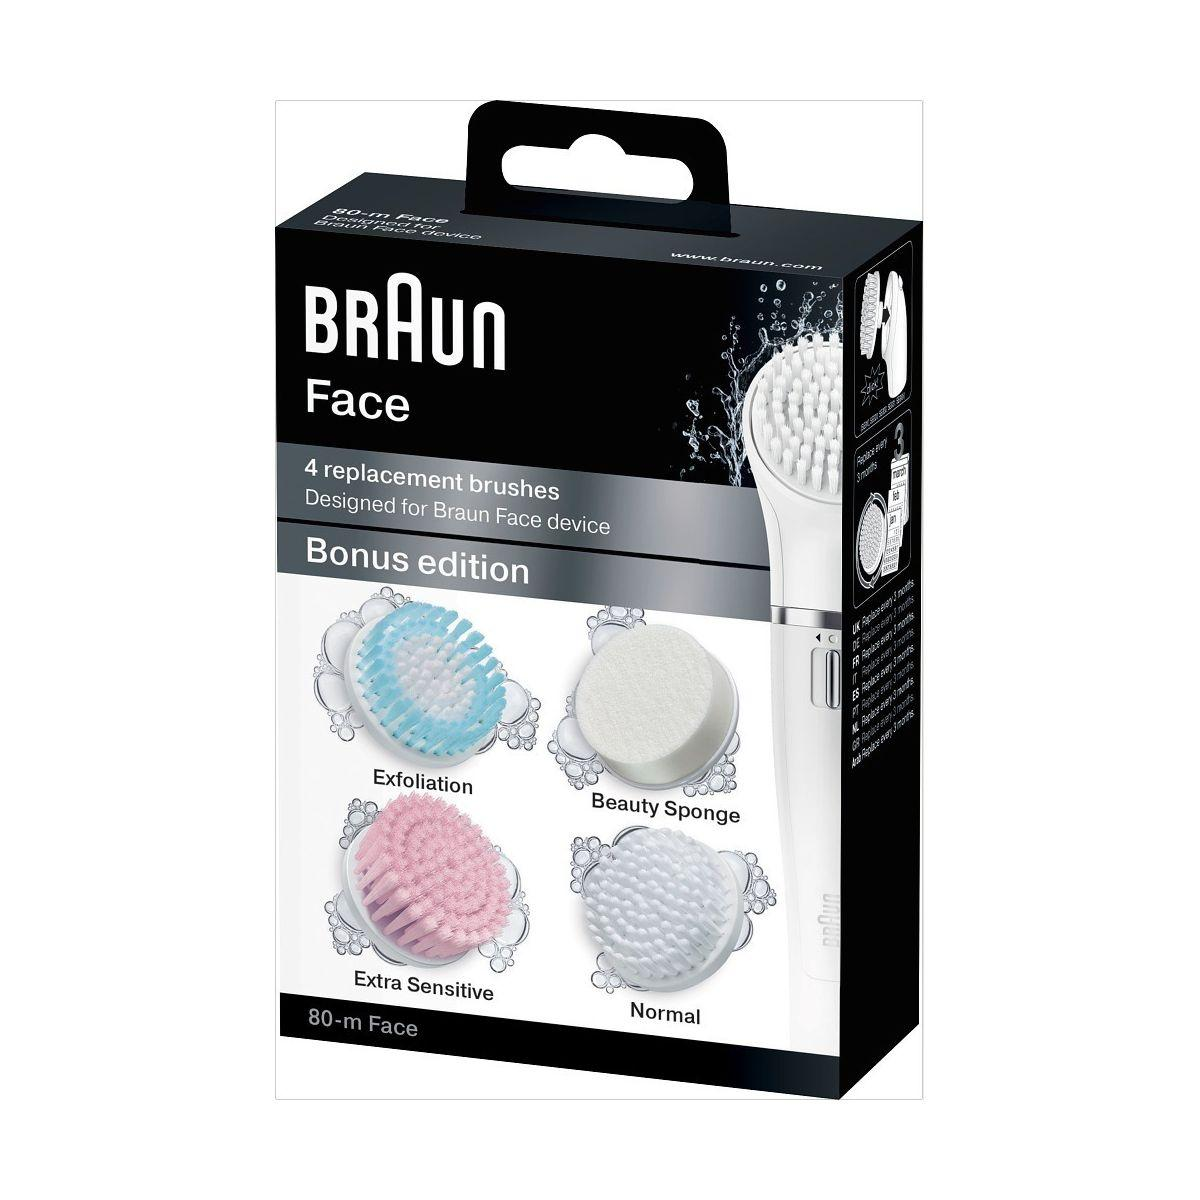 Brosse braun multipack acc brosses - 5% de remise immédiate avec le code : top5 (photo)